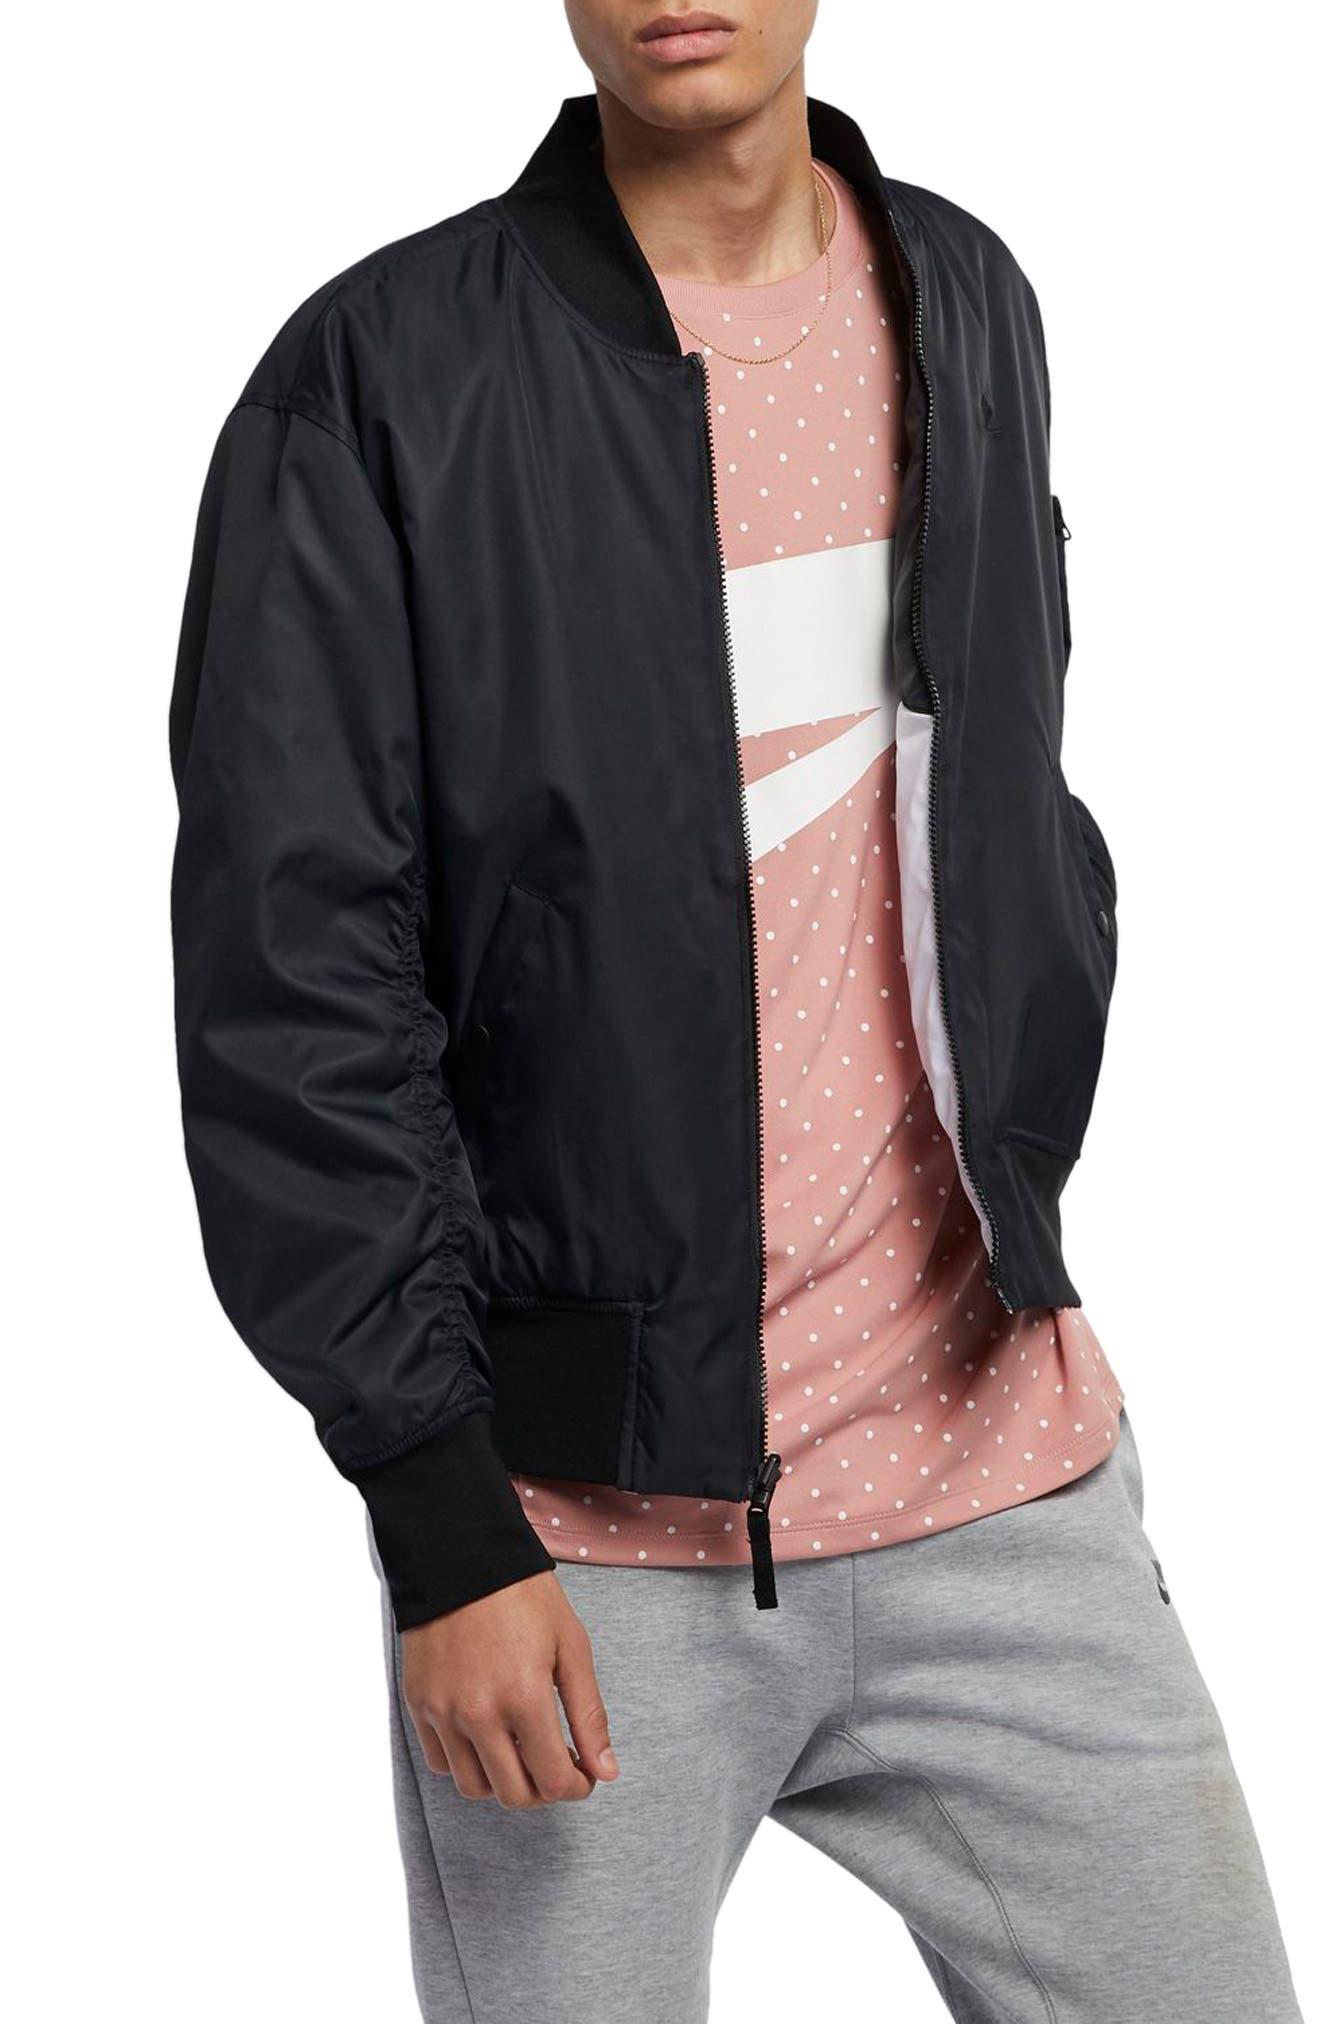 Sportswear Reversible Insulated Bomber Jacket,                             Main thumbnail 1, color,                             BLACK/ BLACK/ WHITE/ WHITE